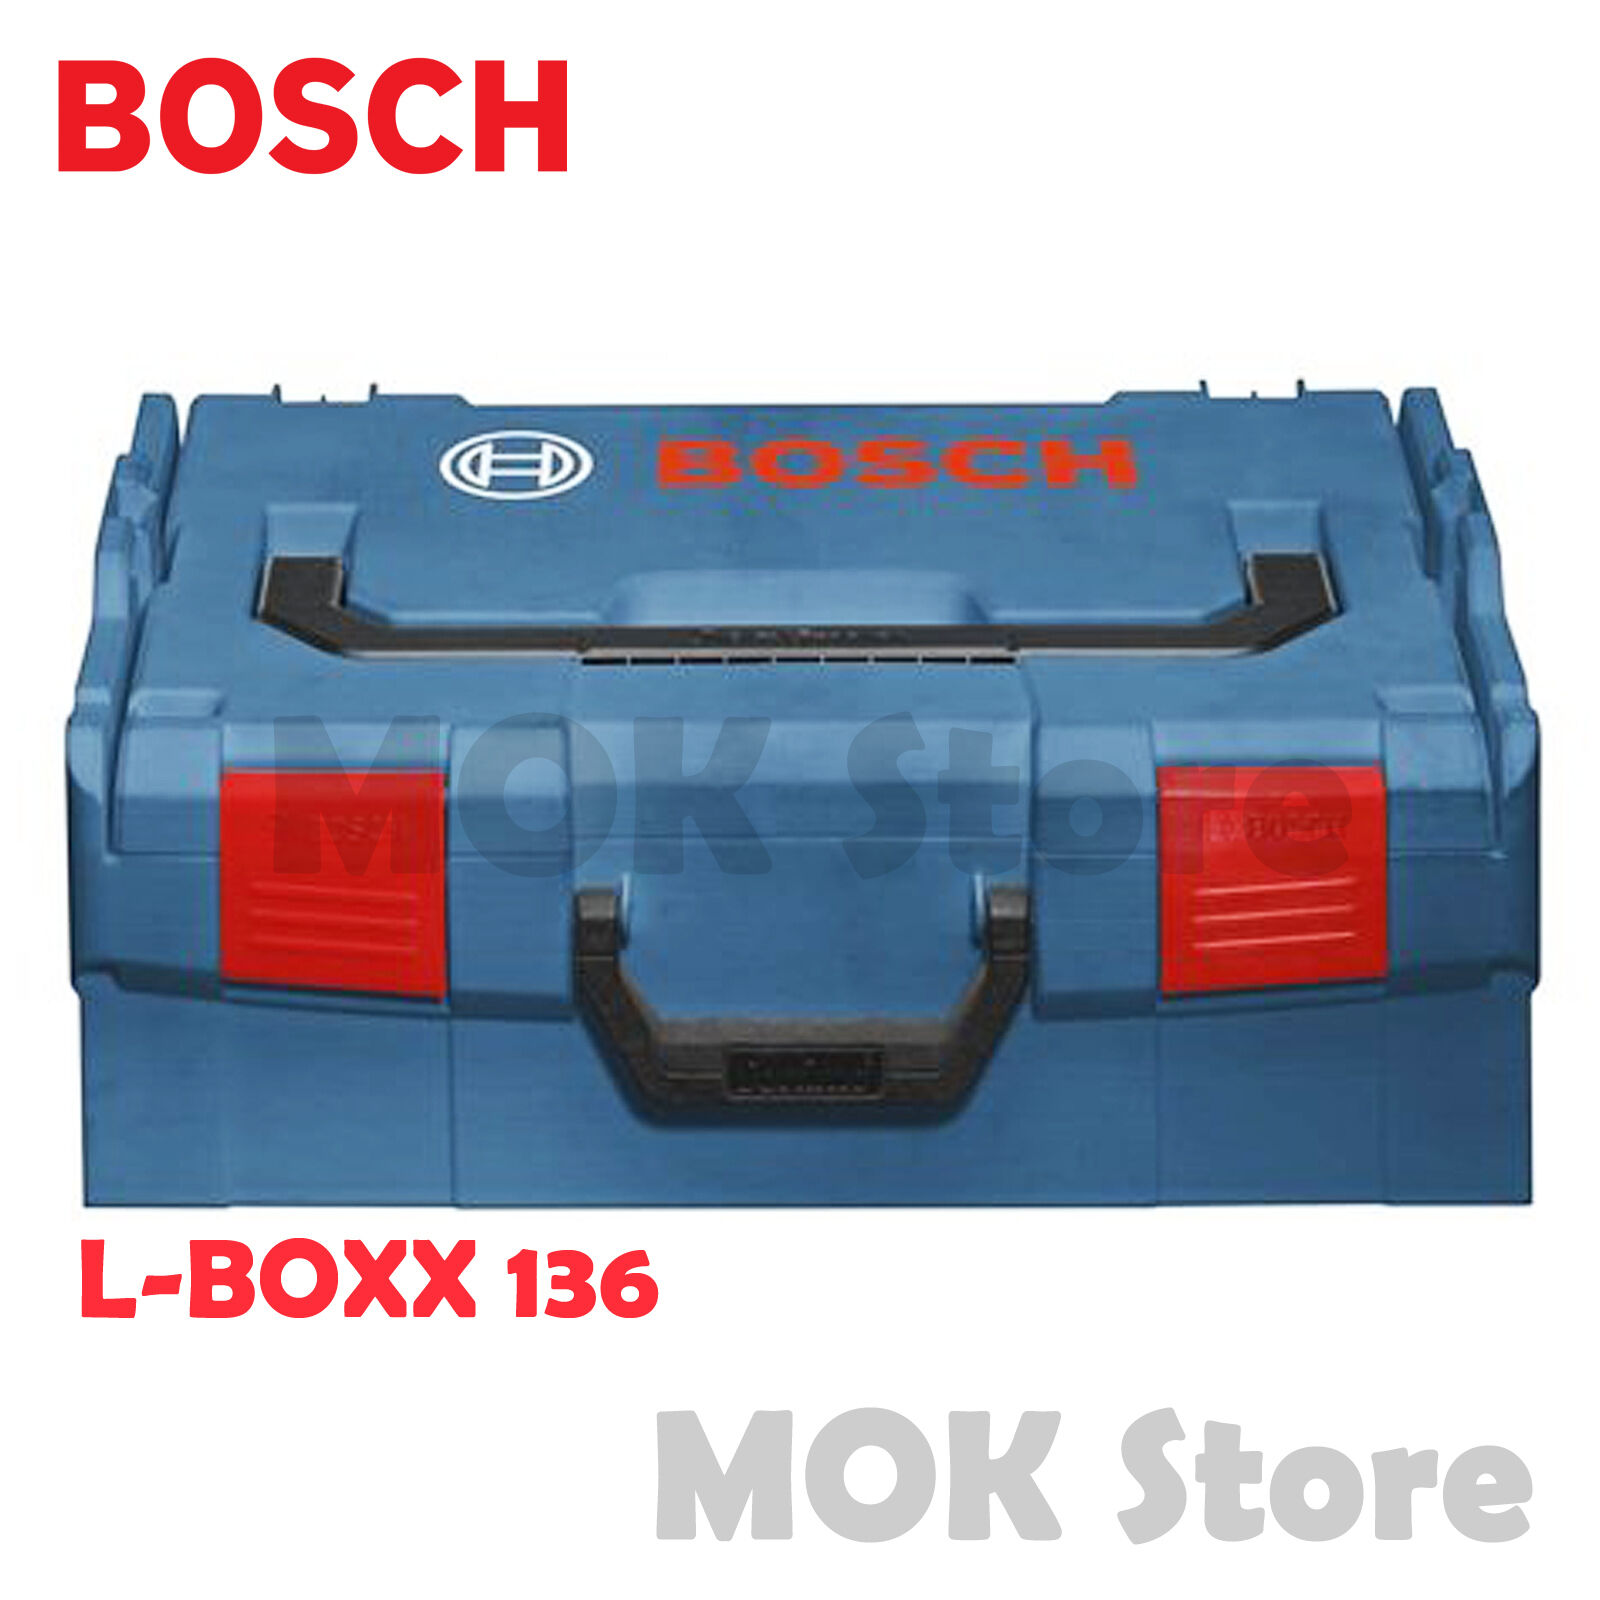 Bosch professional l boxx